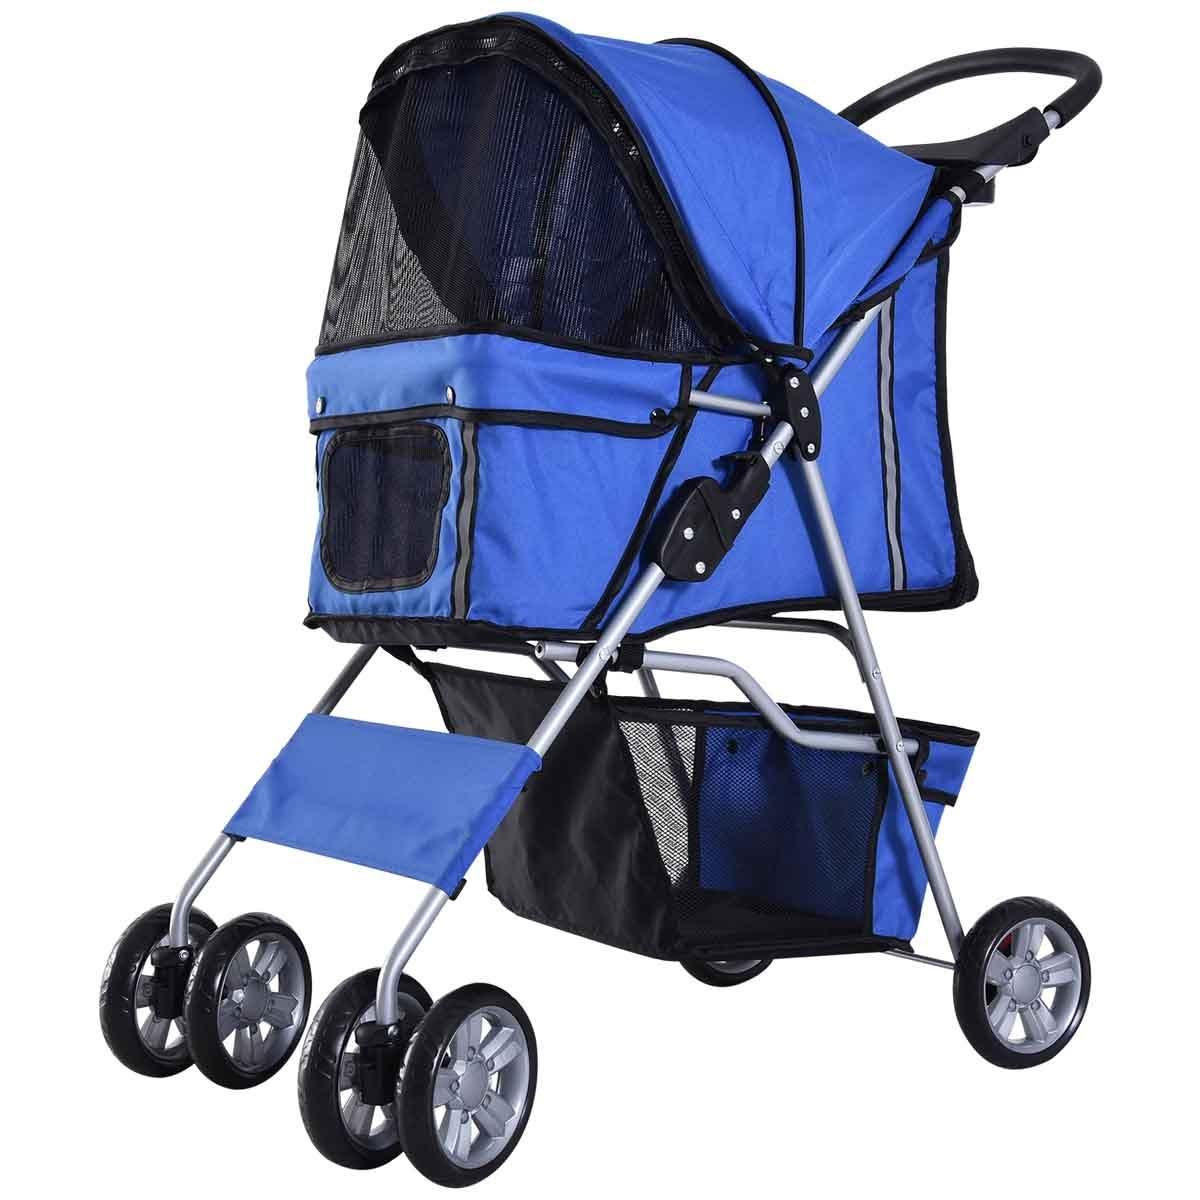 PawHut 4 Wheel Pet Stroller Pram - Blue